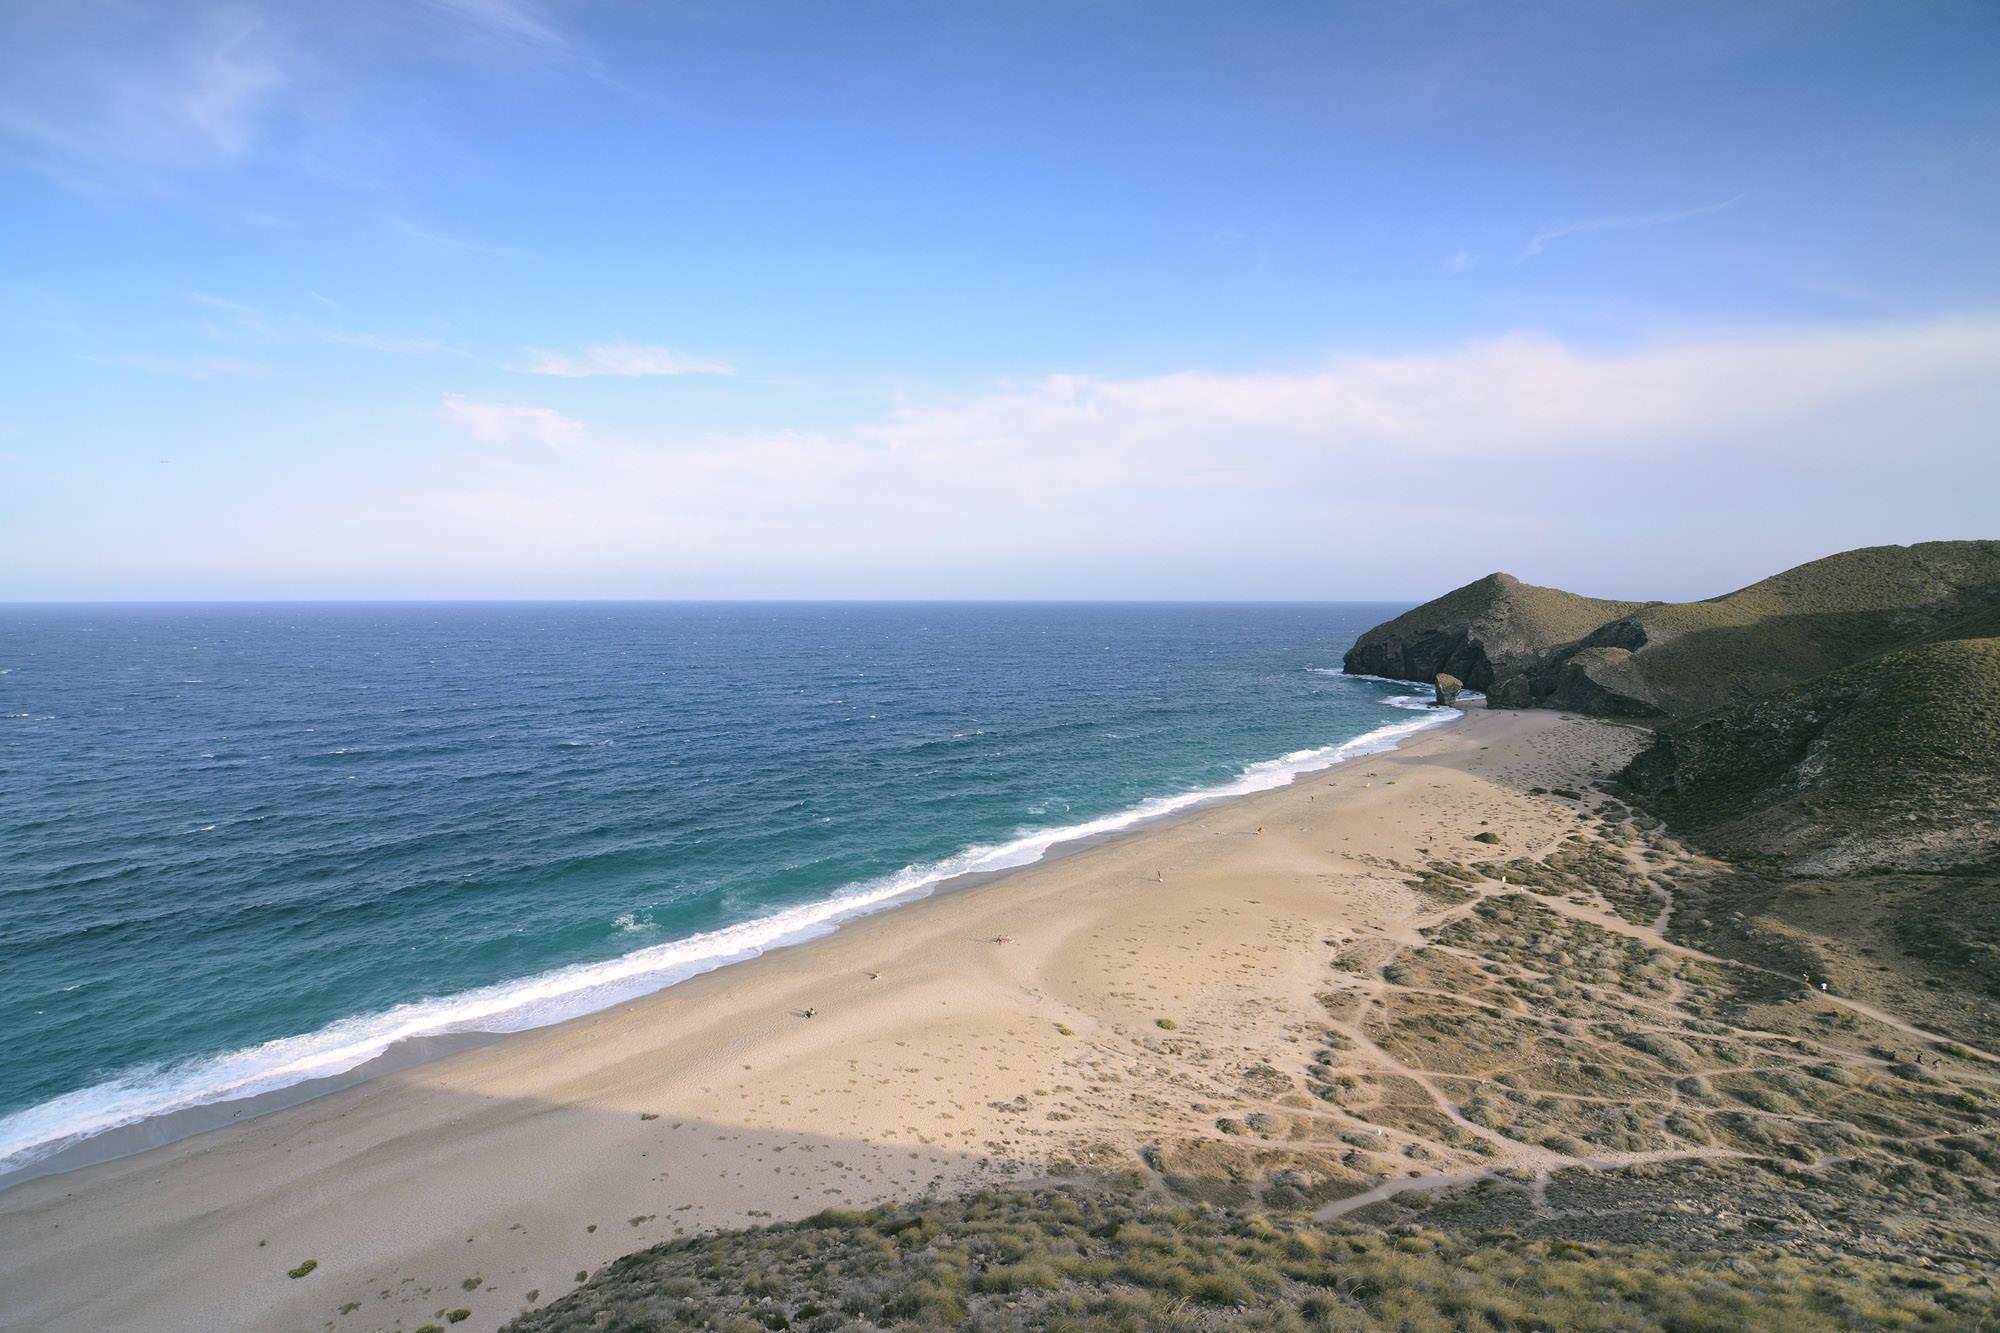 Costa de almer a bilder fotos andalusien 360 for Gimnasio 360 roquetas de mar